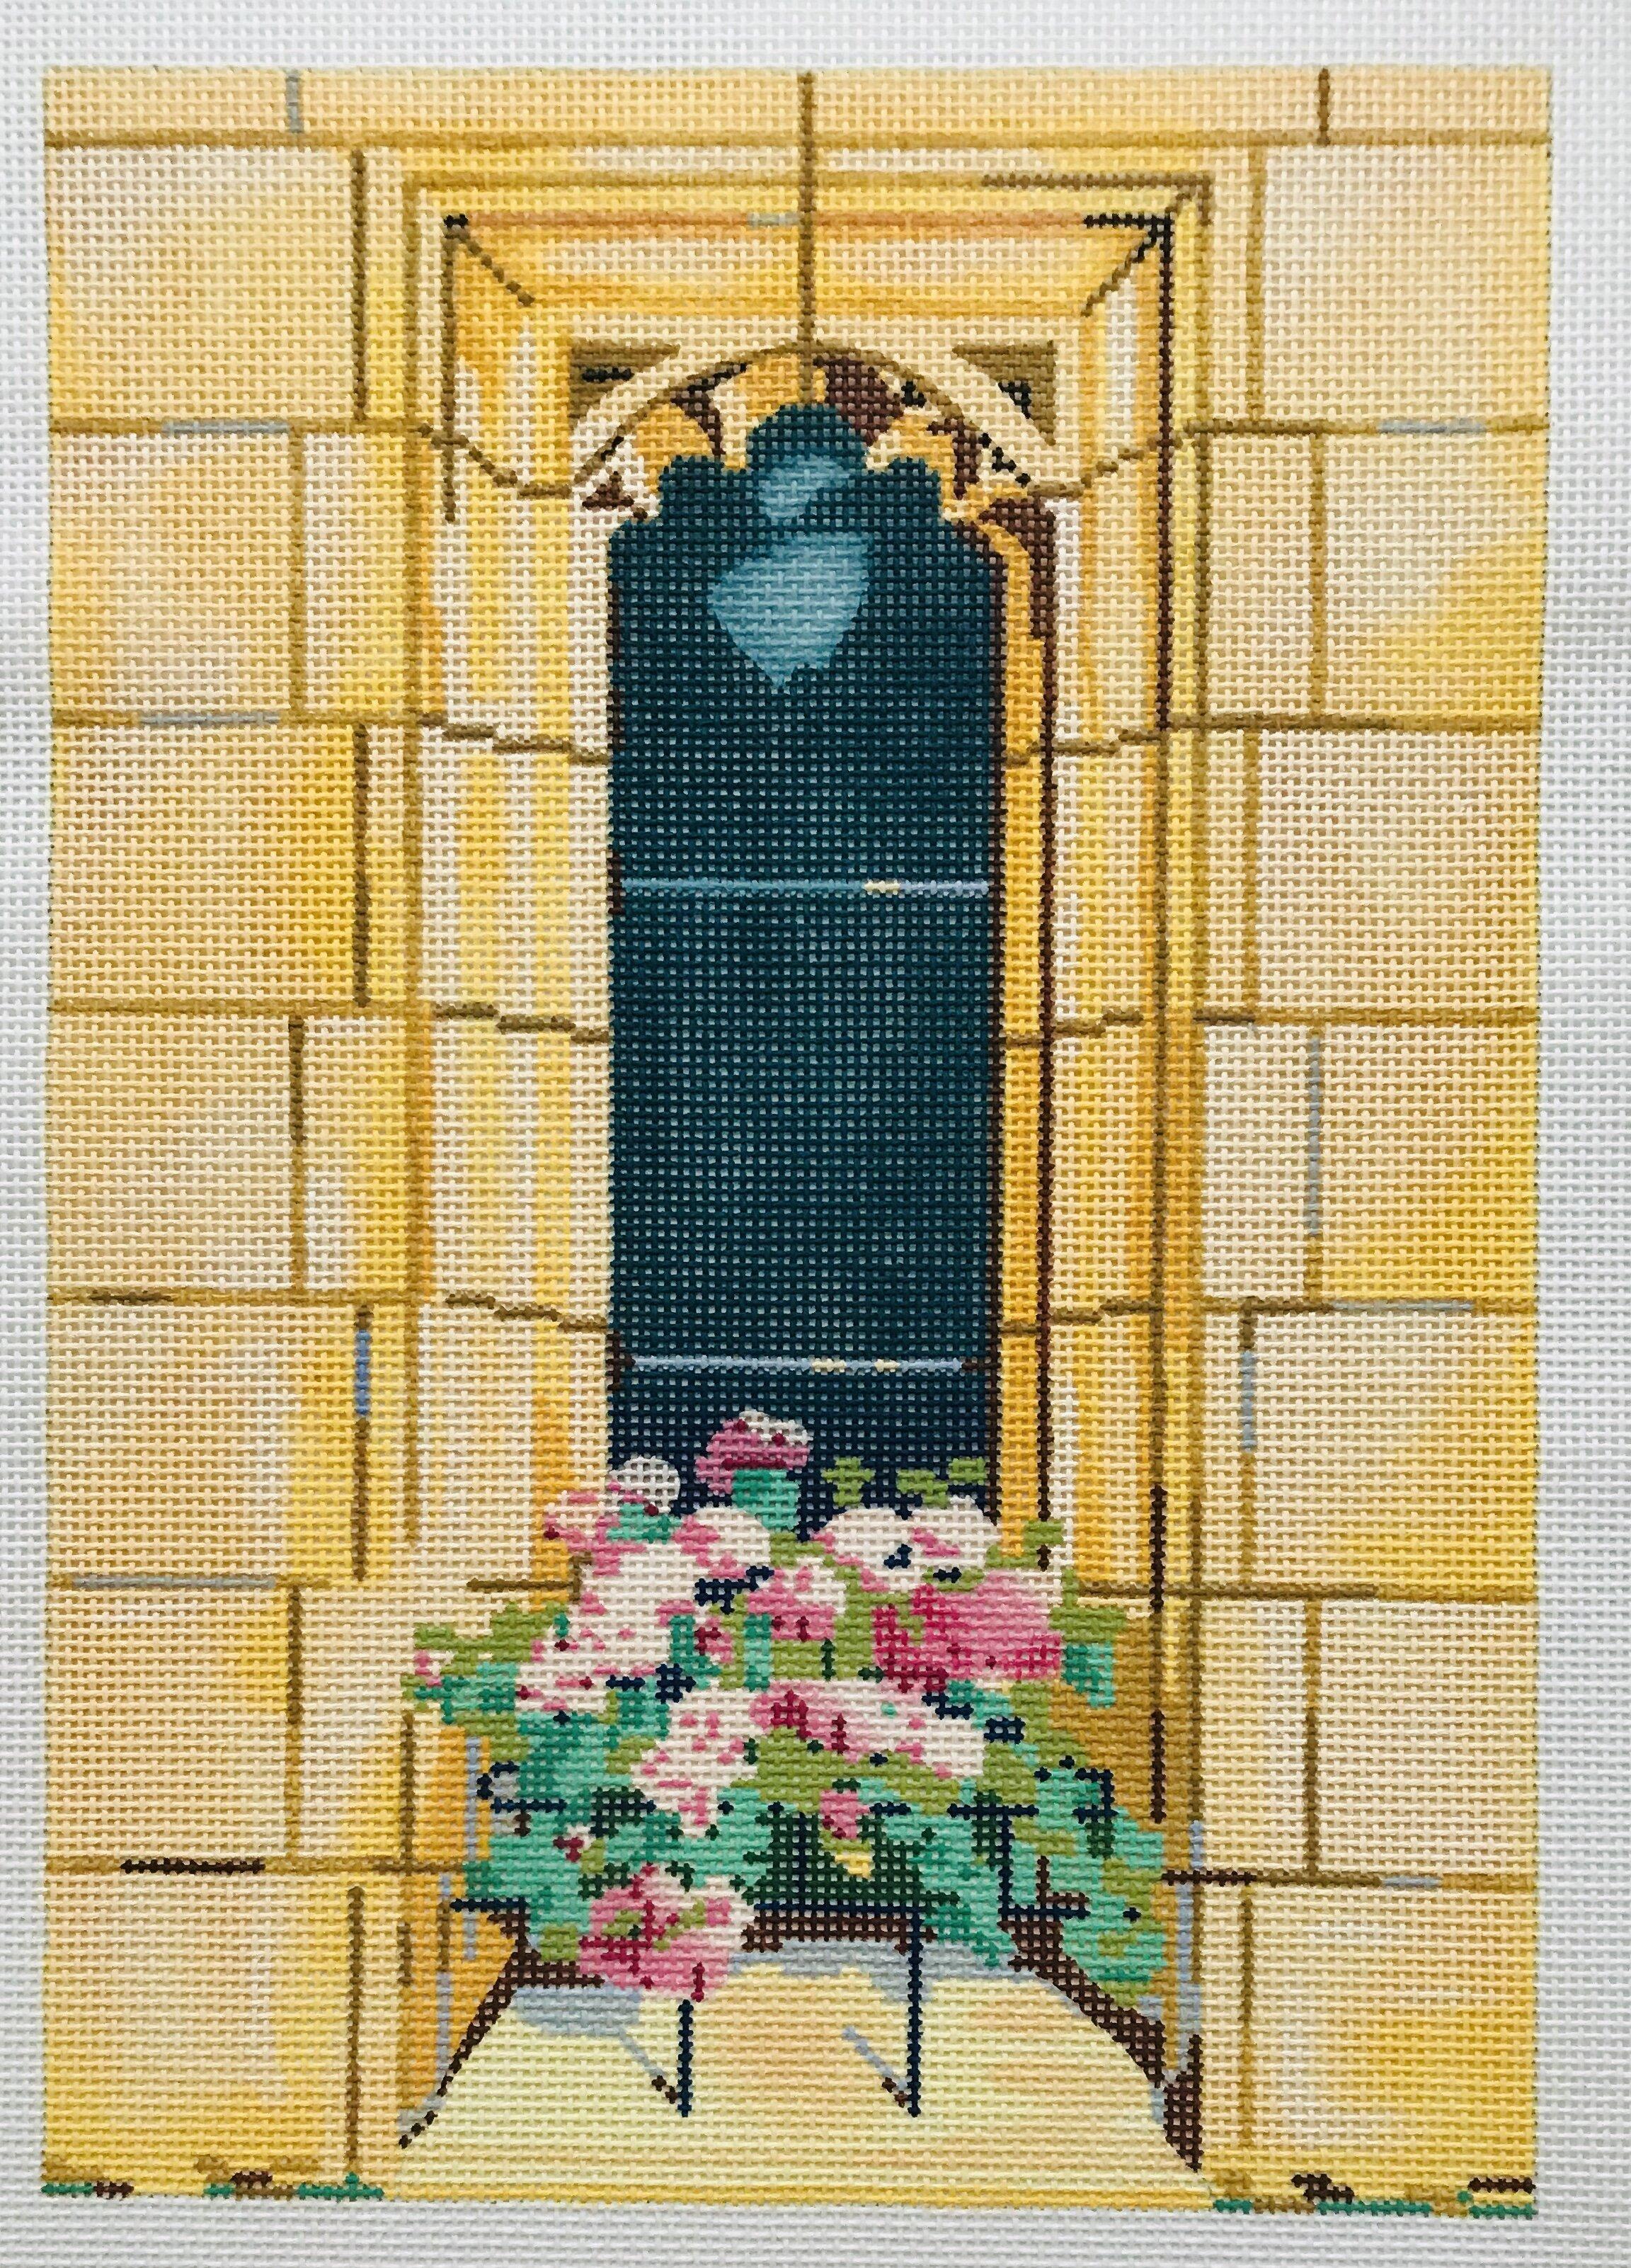 "Catherine's Window AL1   6.75"" x 9.5"" on 18 mesh"